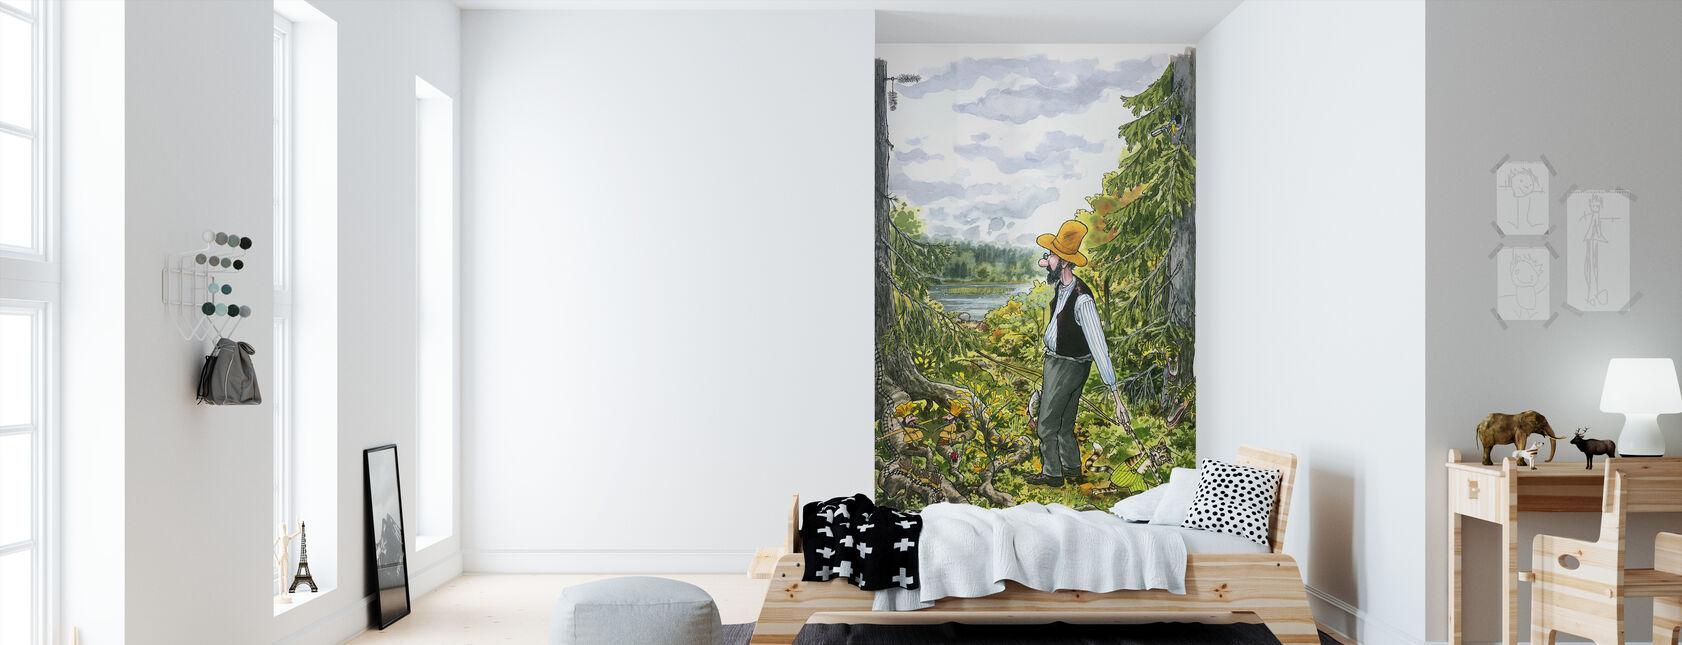 Pettson and Findus - Pettson Tents - Fishing Tour - Wallpaper - Kids Room